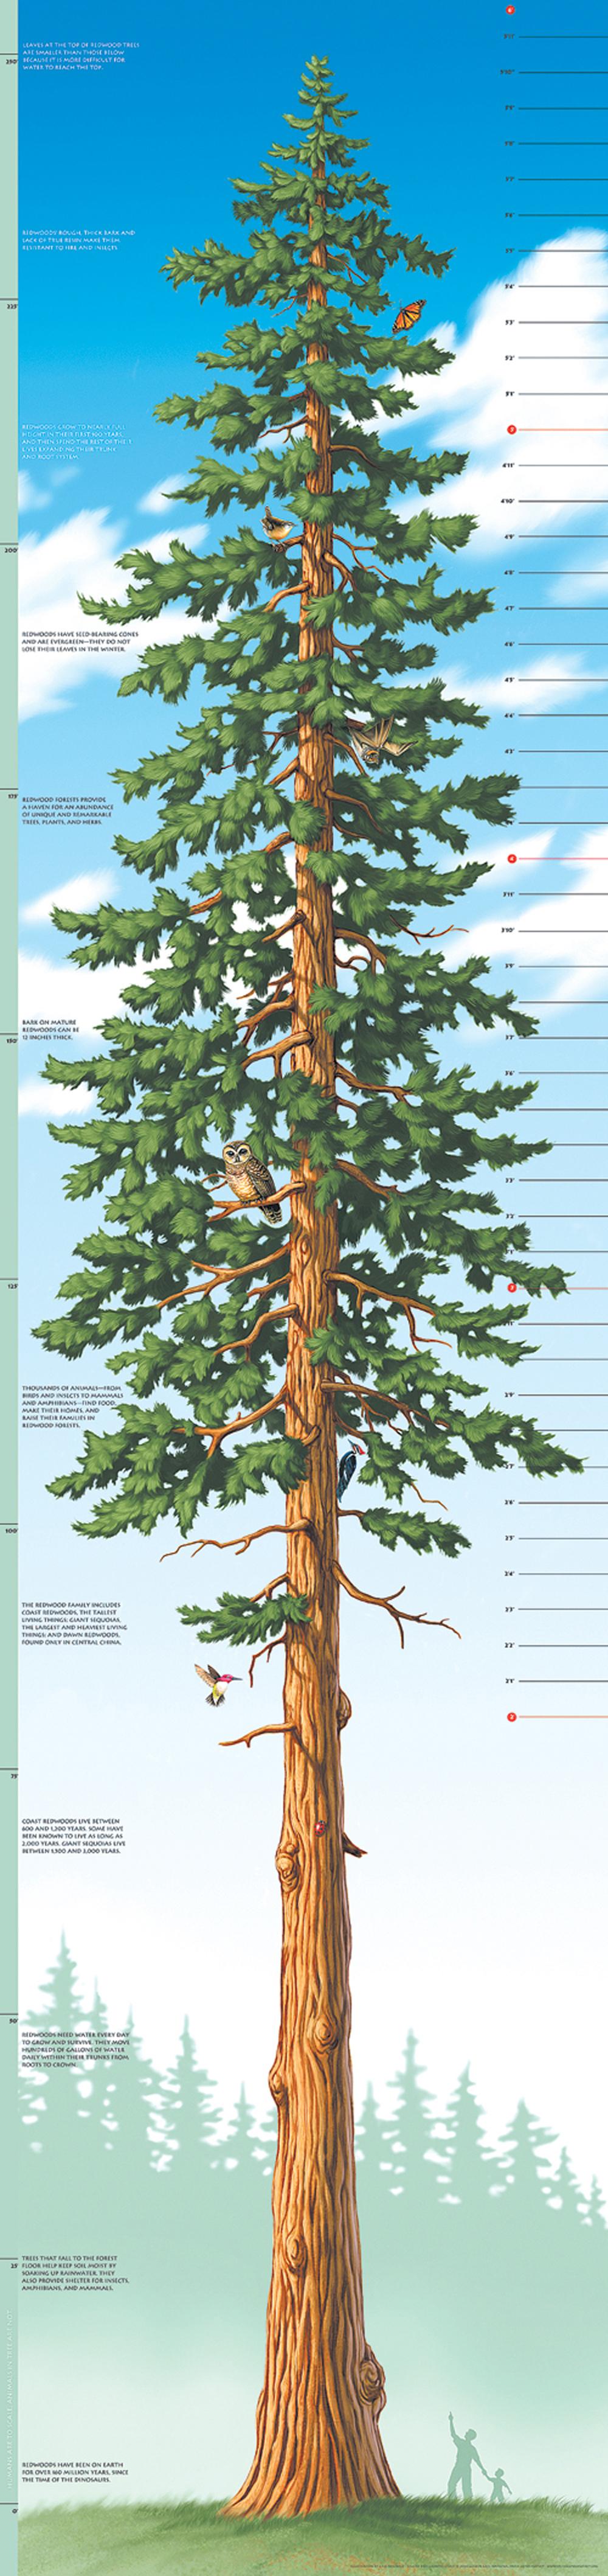 Tallest Tree Growth Chart